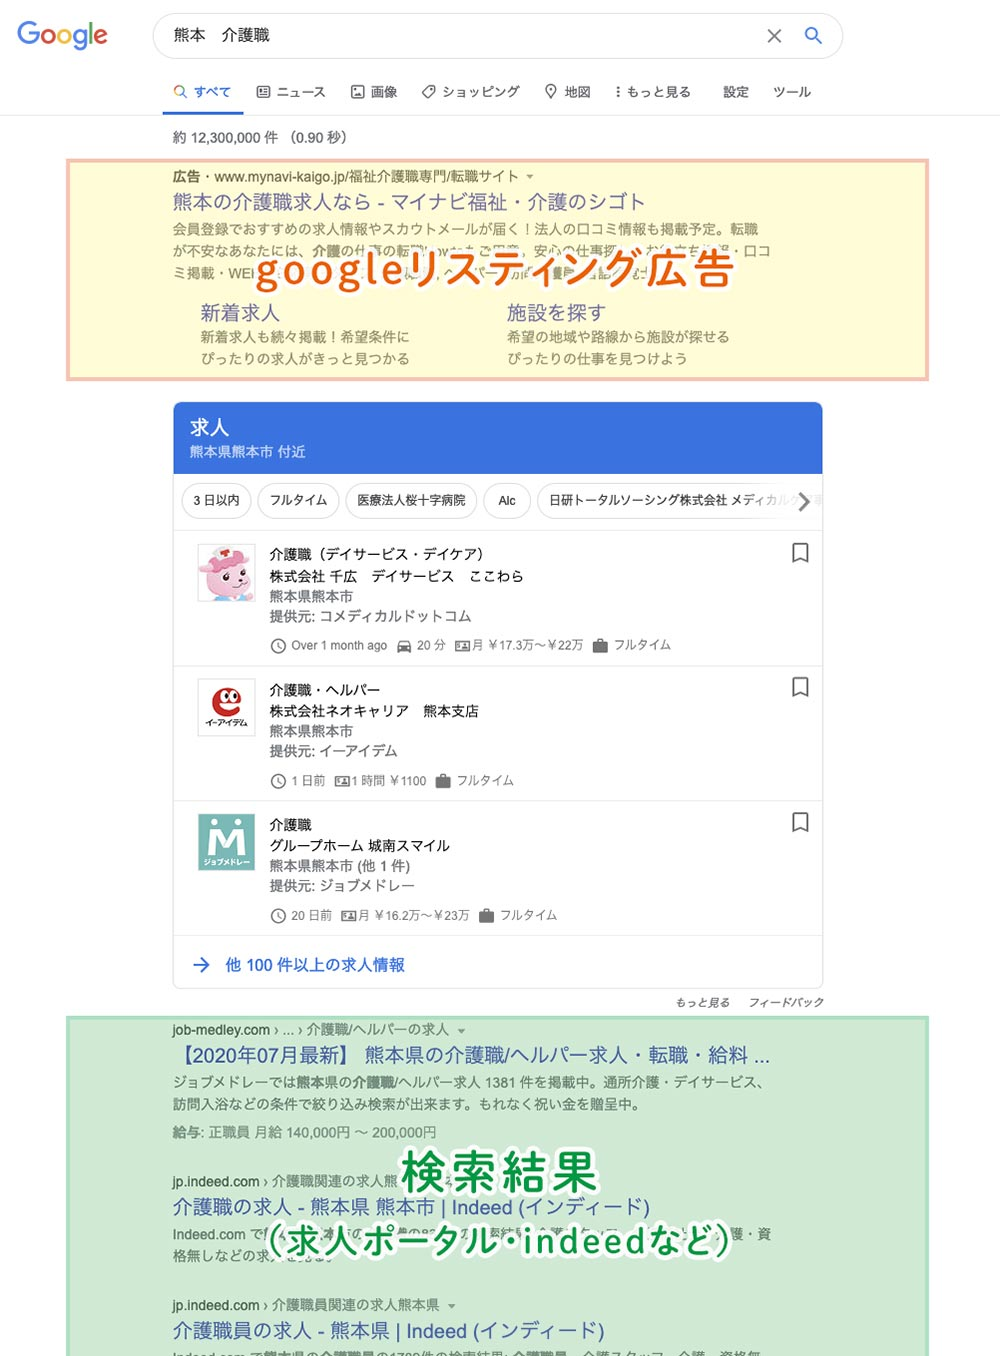 googleしごと検索の検索結果イメージ2